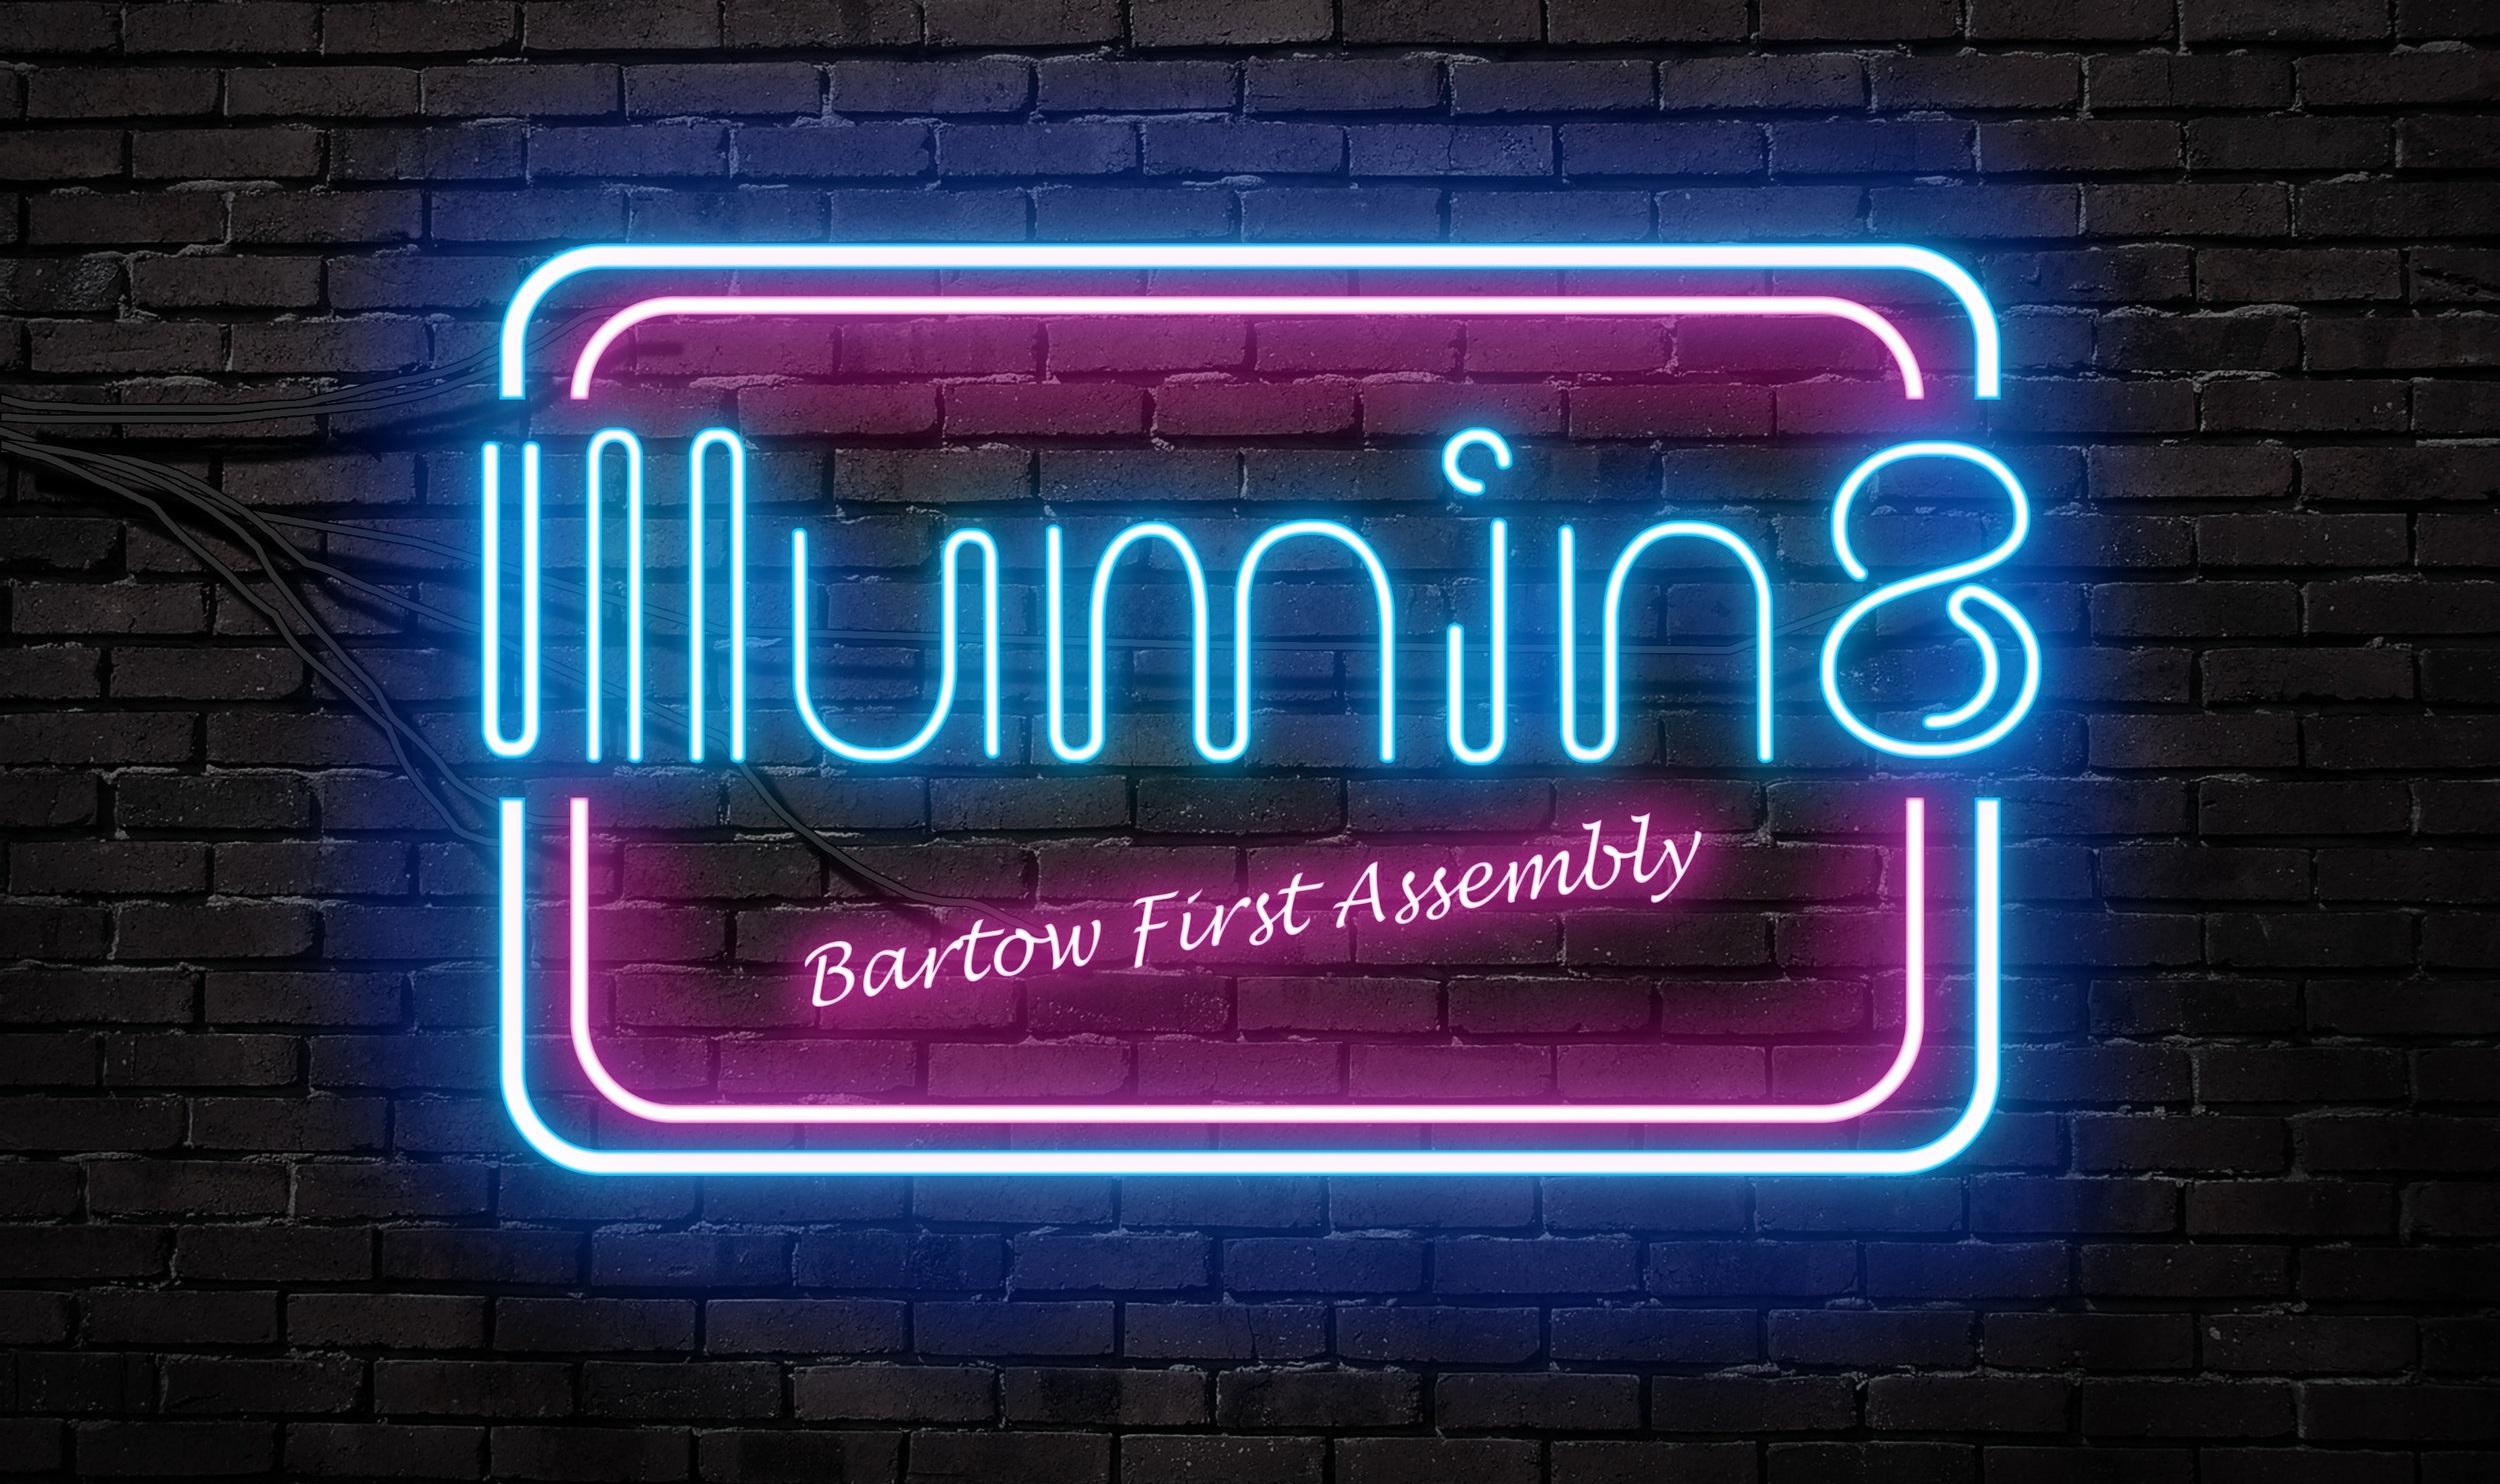 Illumin8+Logo+Brick.jpg